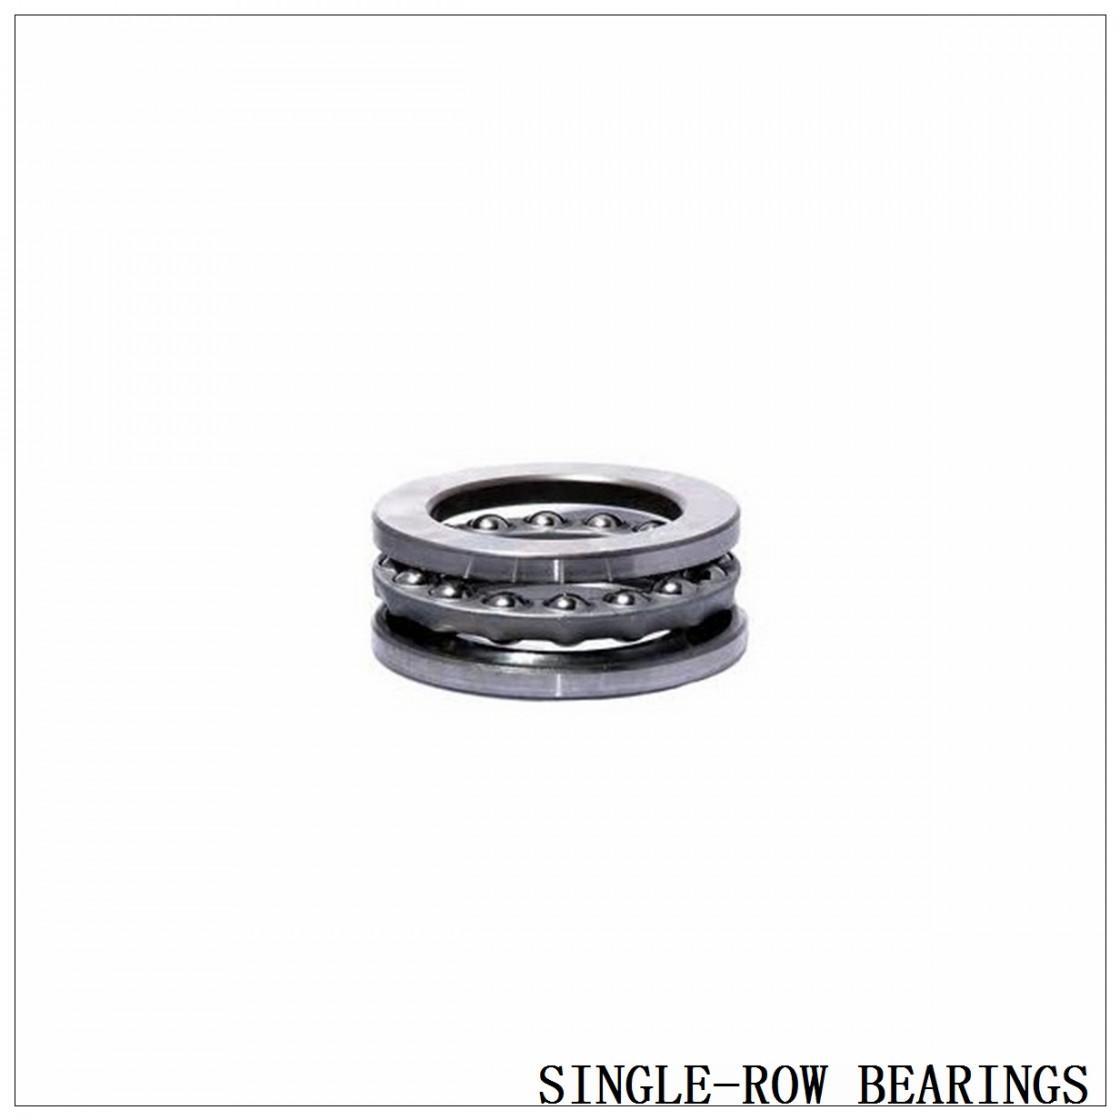 NSK R790-1 SINGLE-ROW BEARINGS